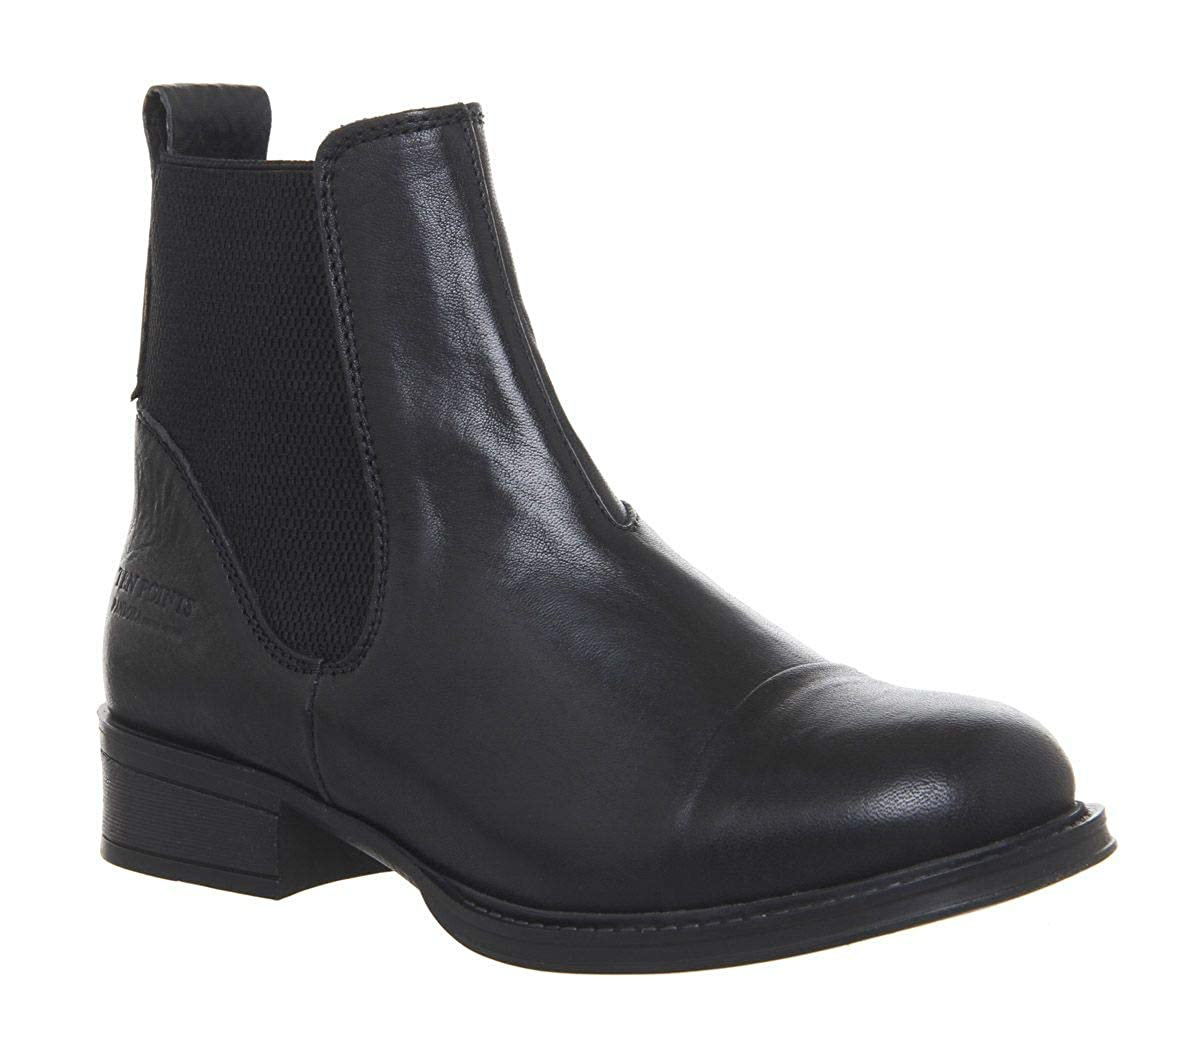 Femme Ten Boots PandoraChelsea Ten Points 7fyYvb6g